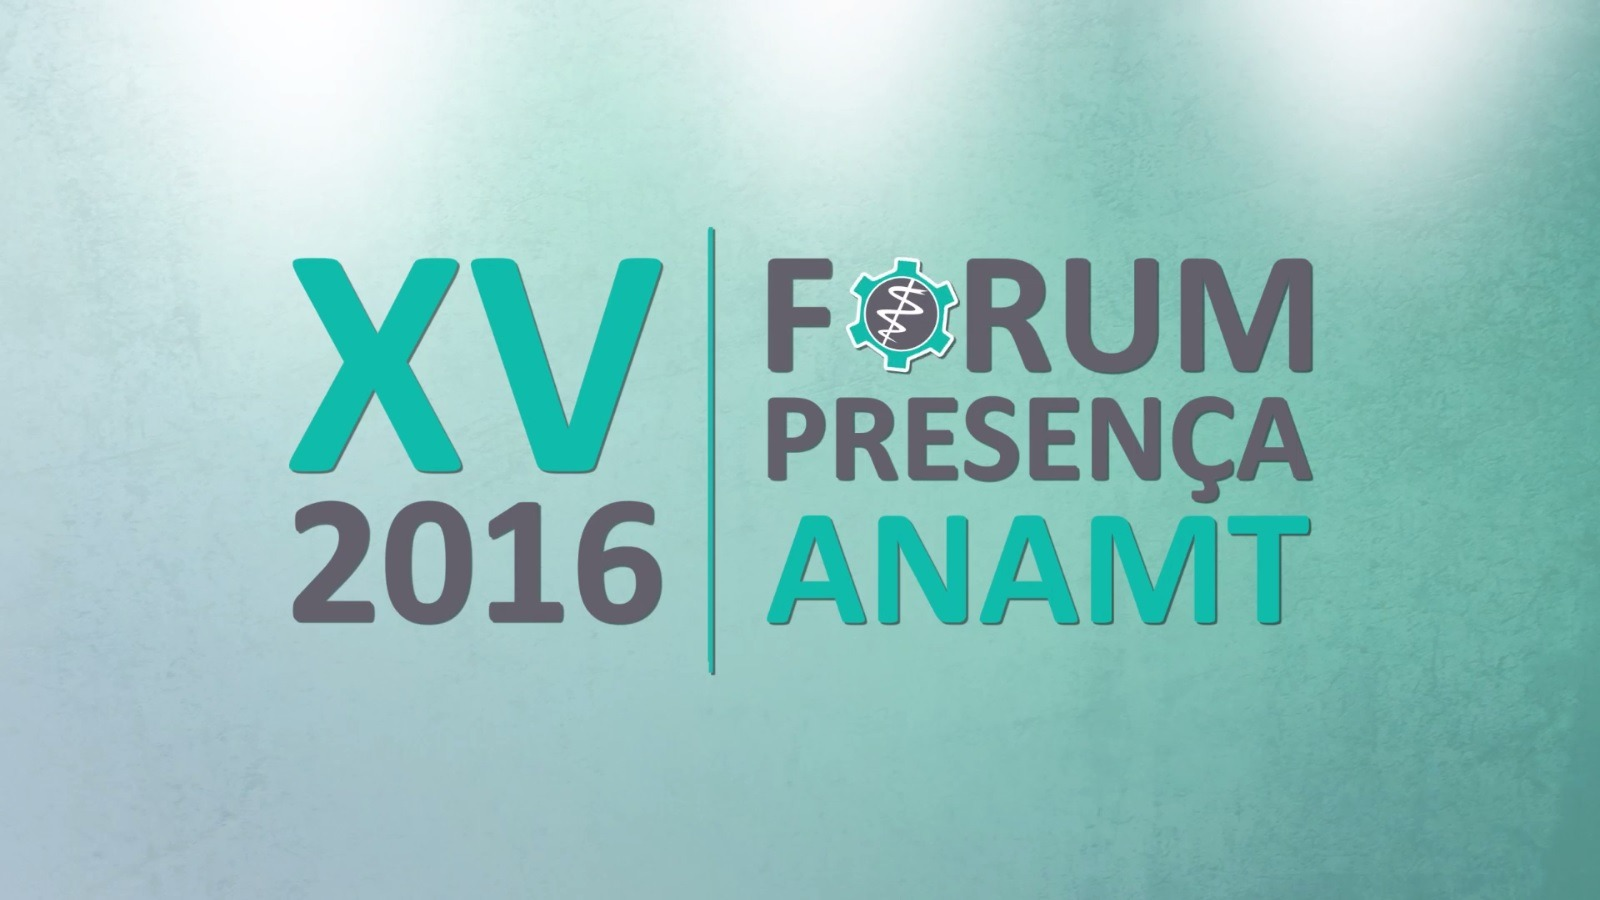 XV Fórum Presença ANAMT